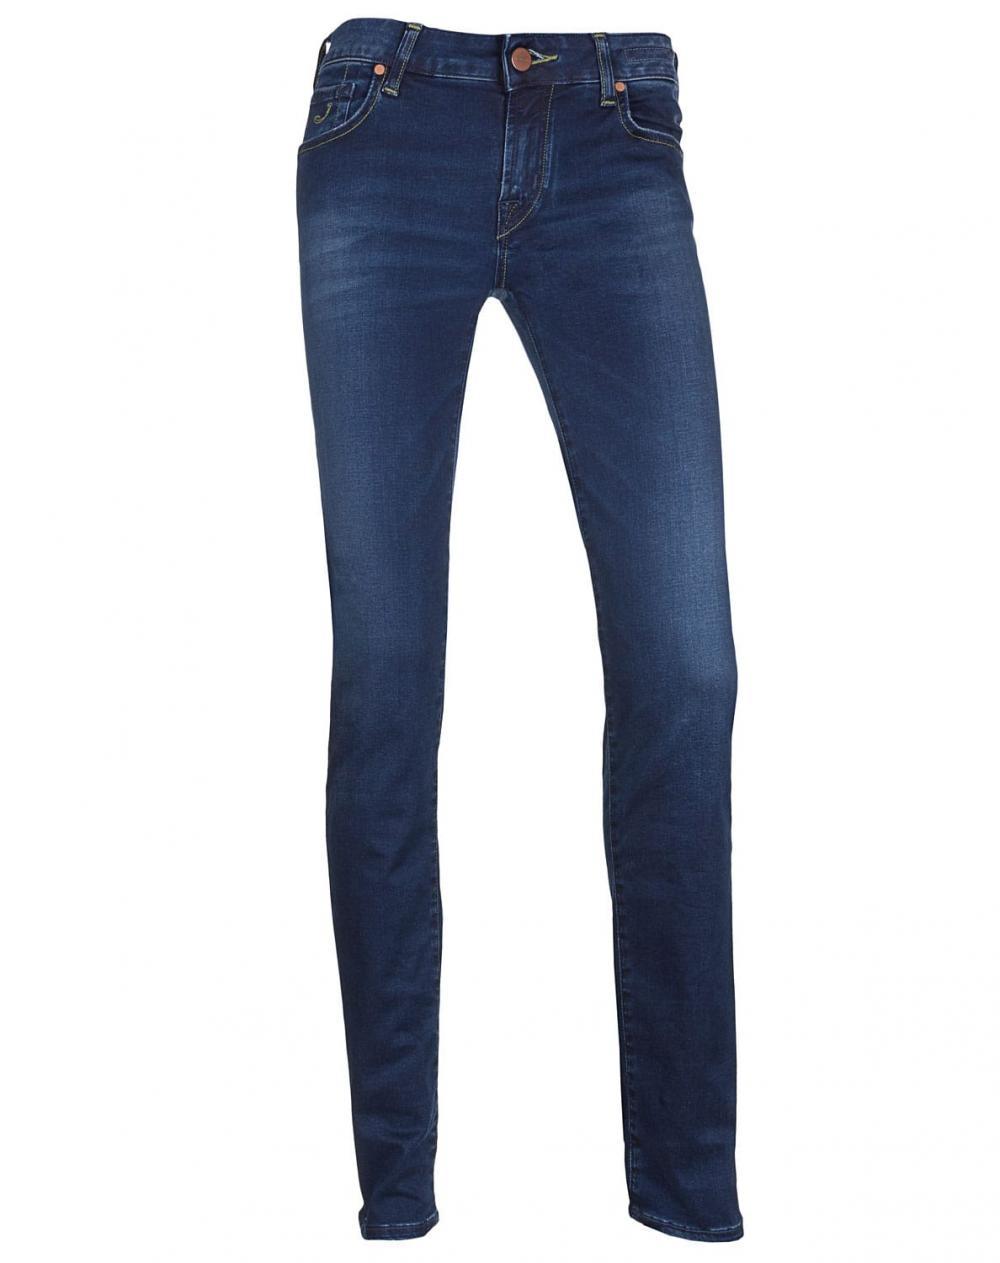 Jeans PW711 Slim